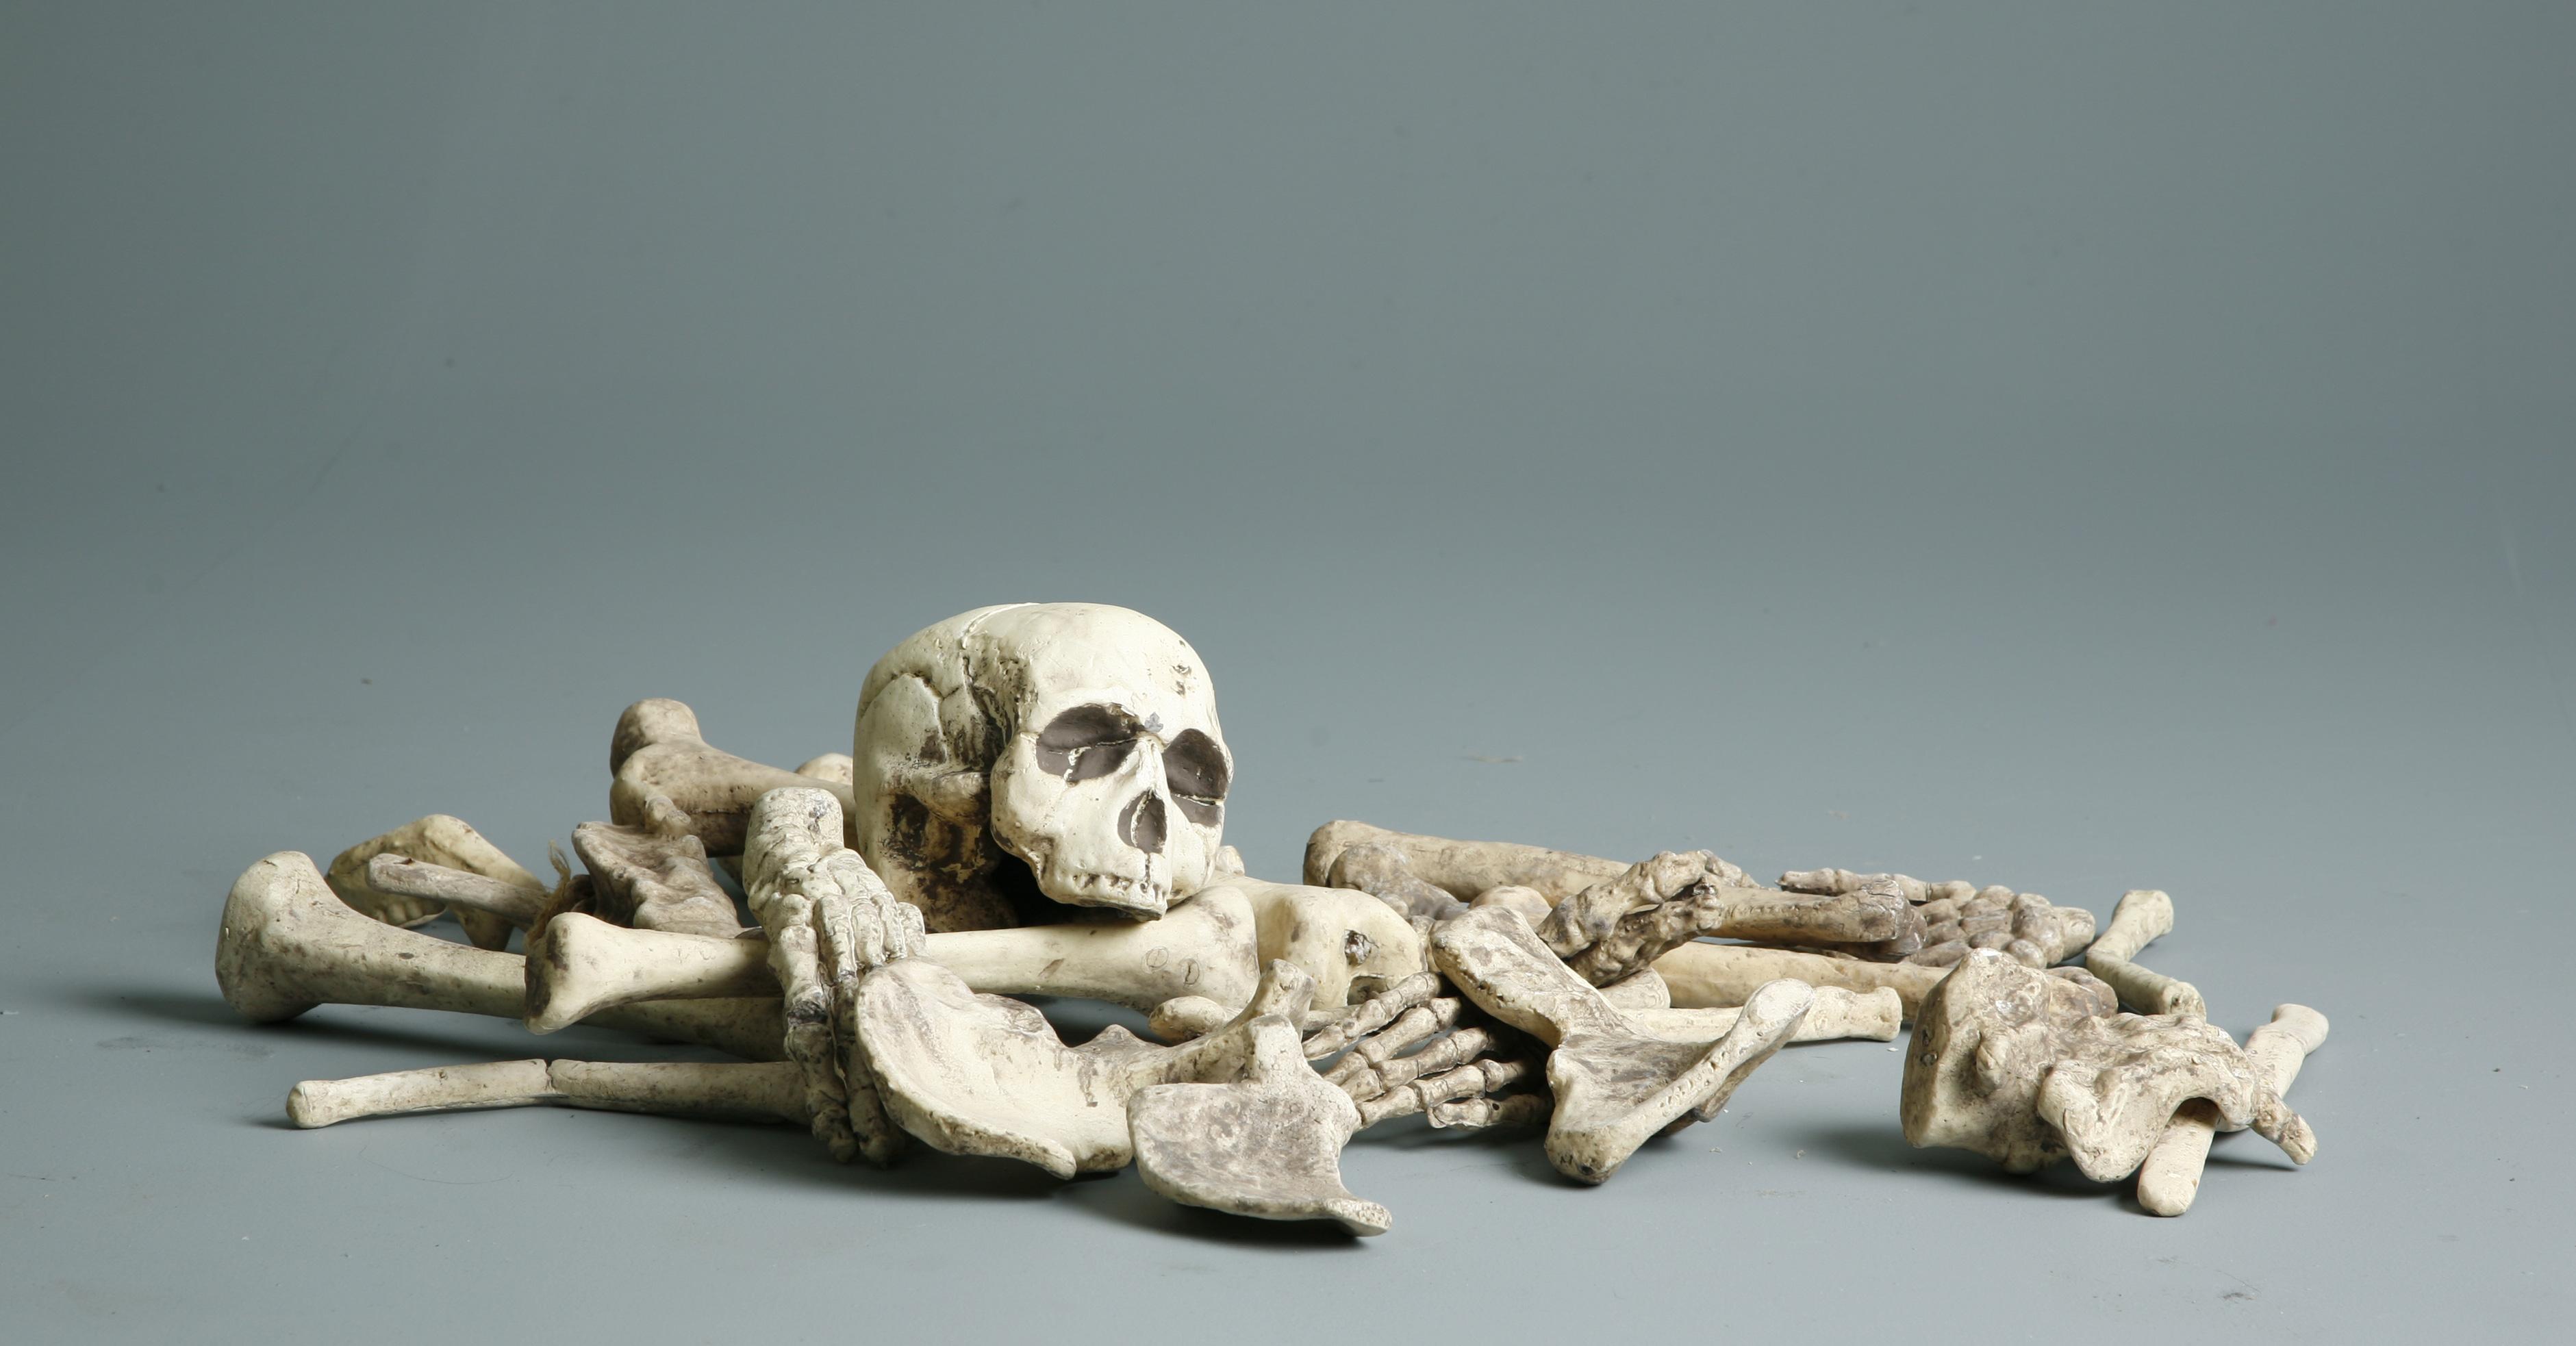 Bones - 1